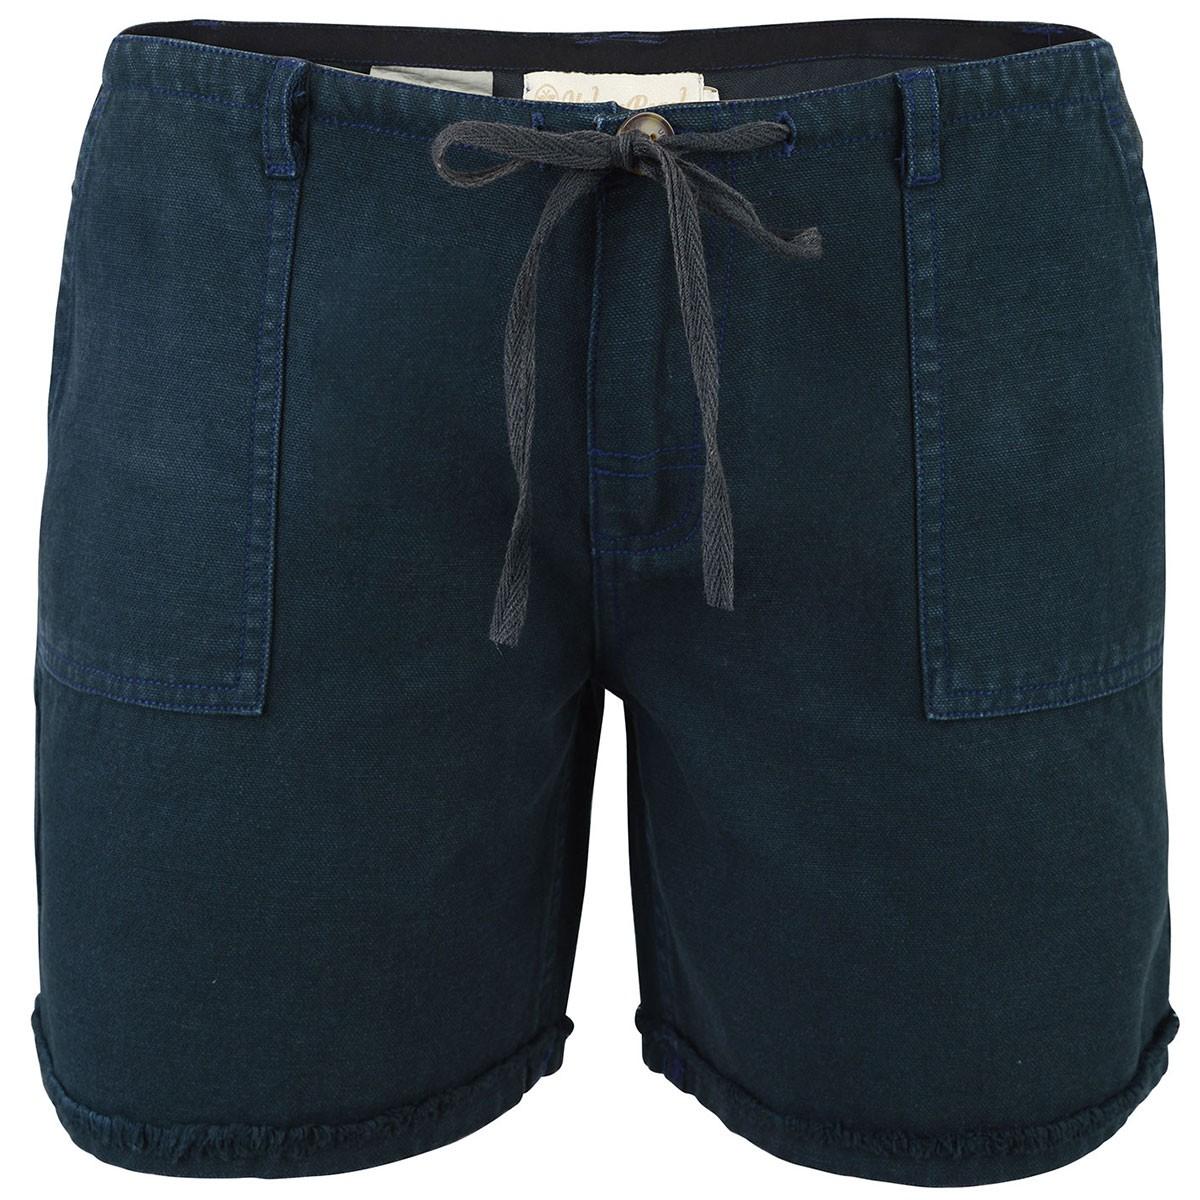 Womens Poipu Shorts - Black